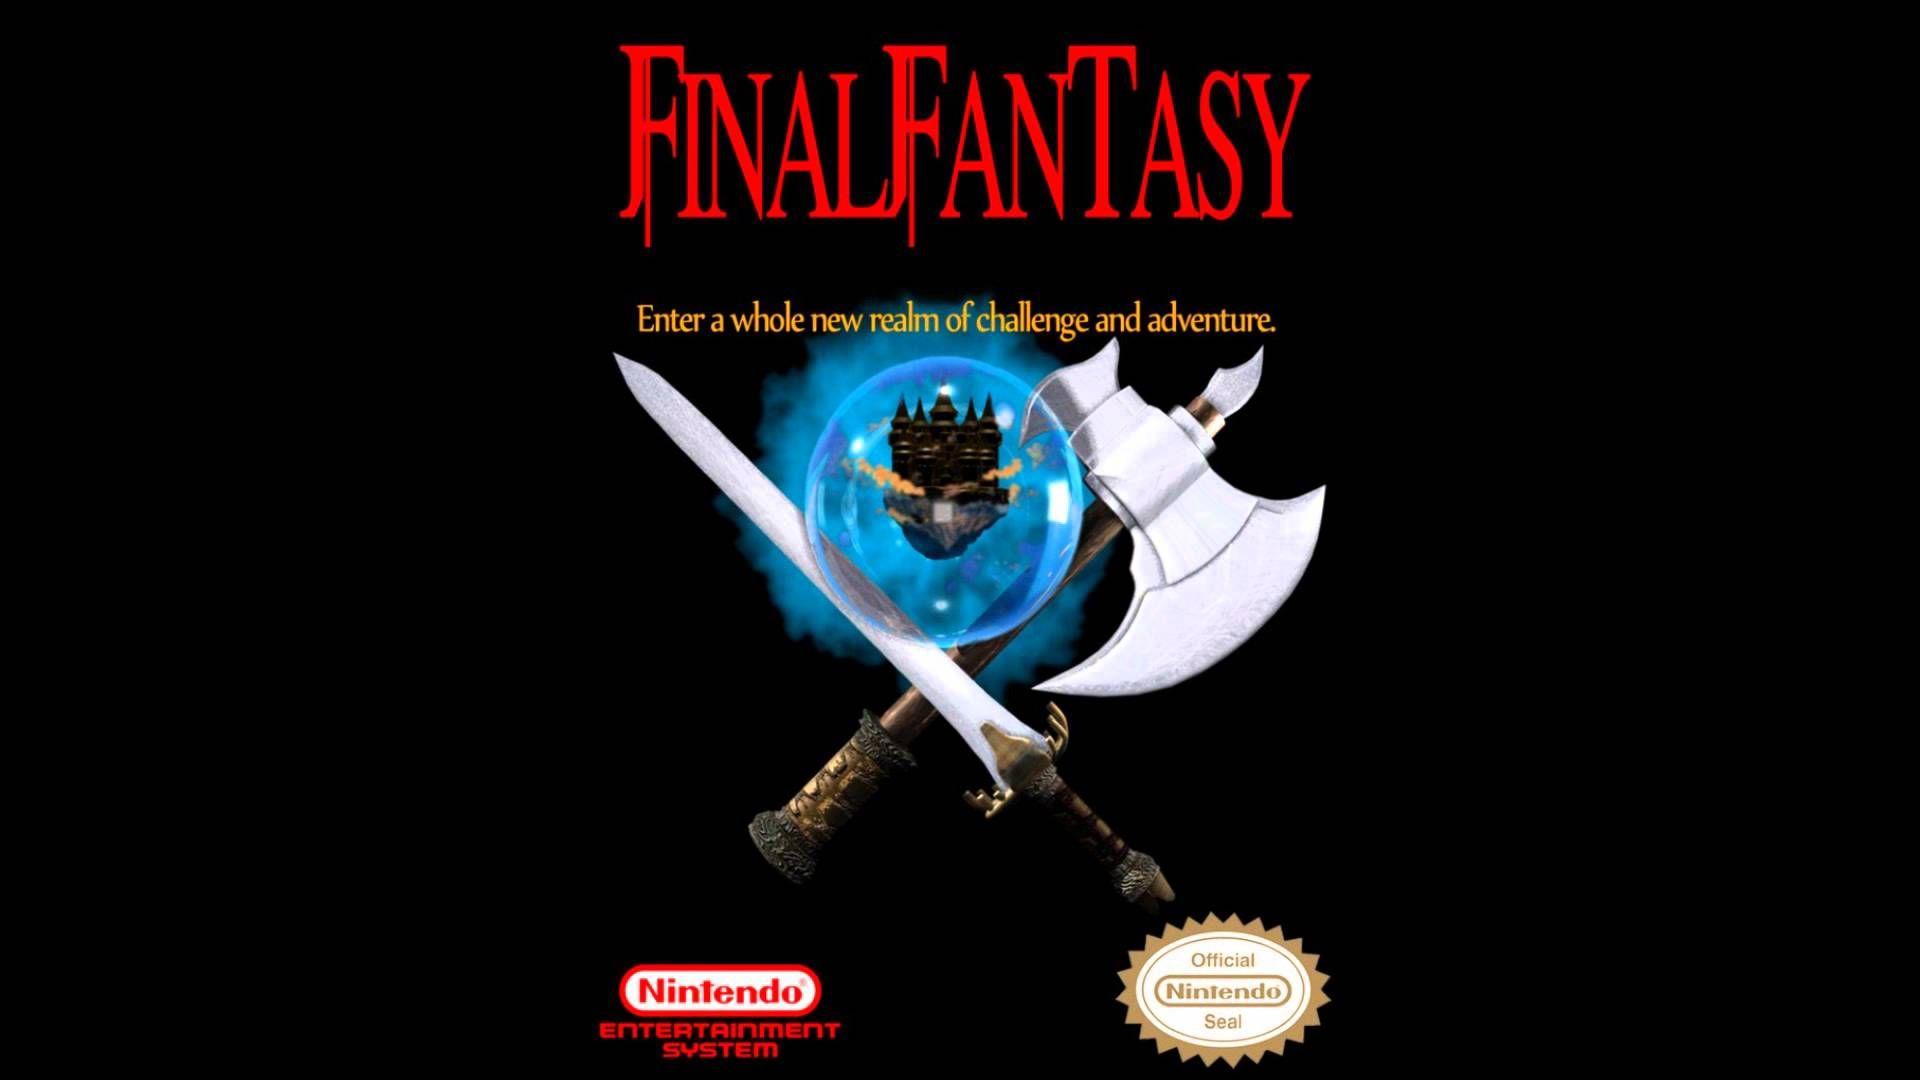 Final Fantasy Nes Chaos Final Fantasy Nes Final Fantasy Fantasy